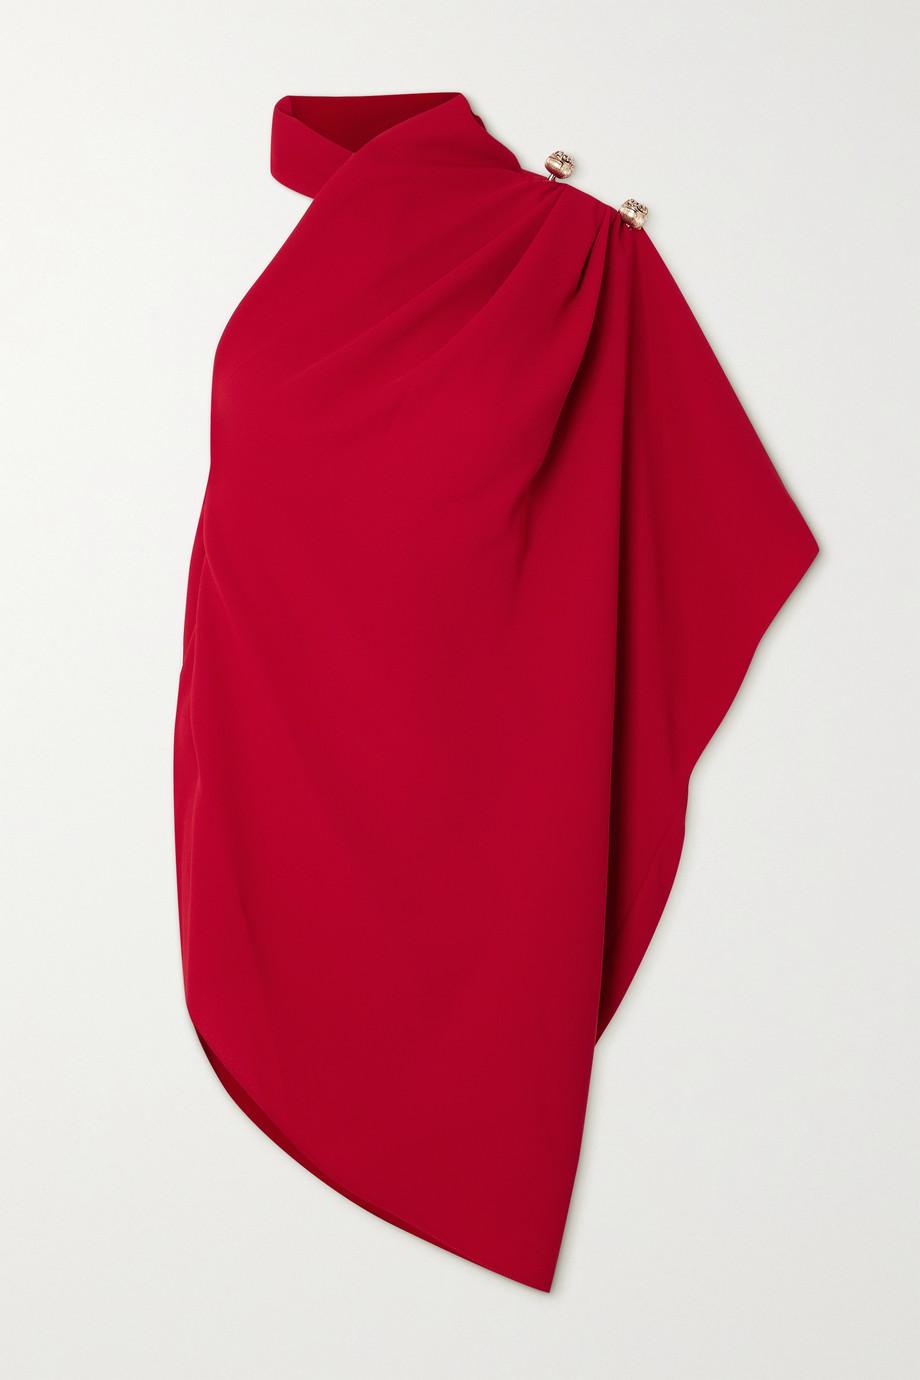 Elie Saab One-sleeve draped crepe top